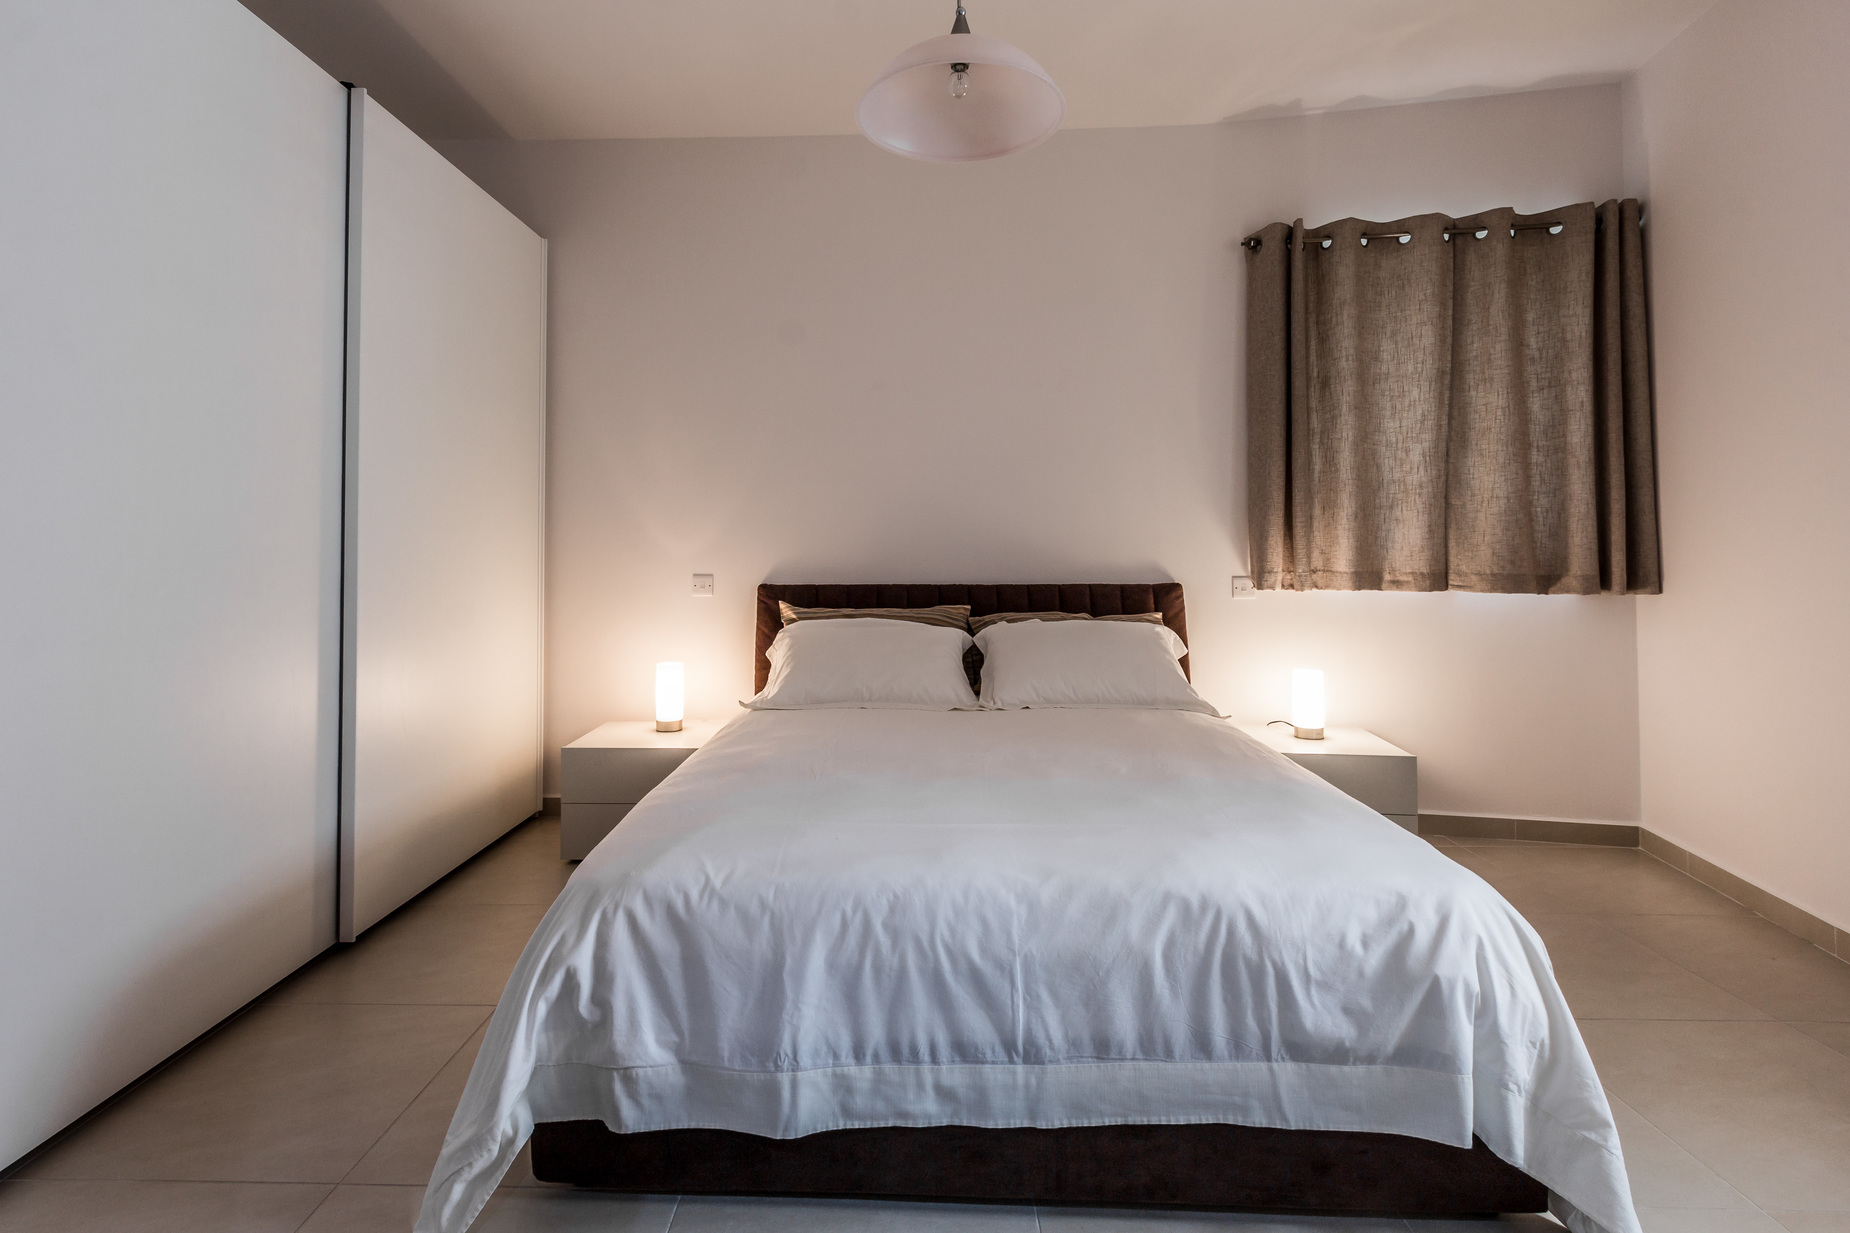 2 bed Apartment For Rent in Marsascala, Marsascala - thumb 10